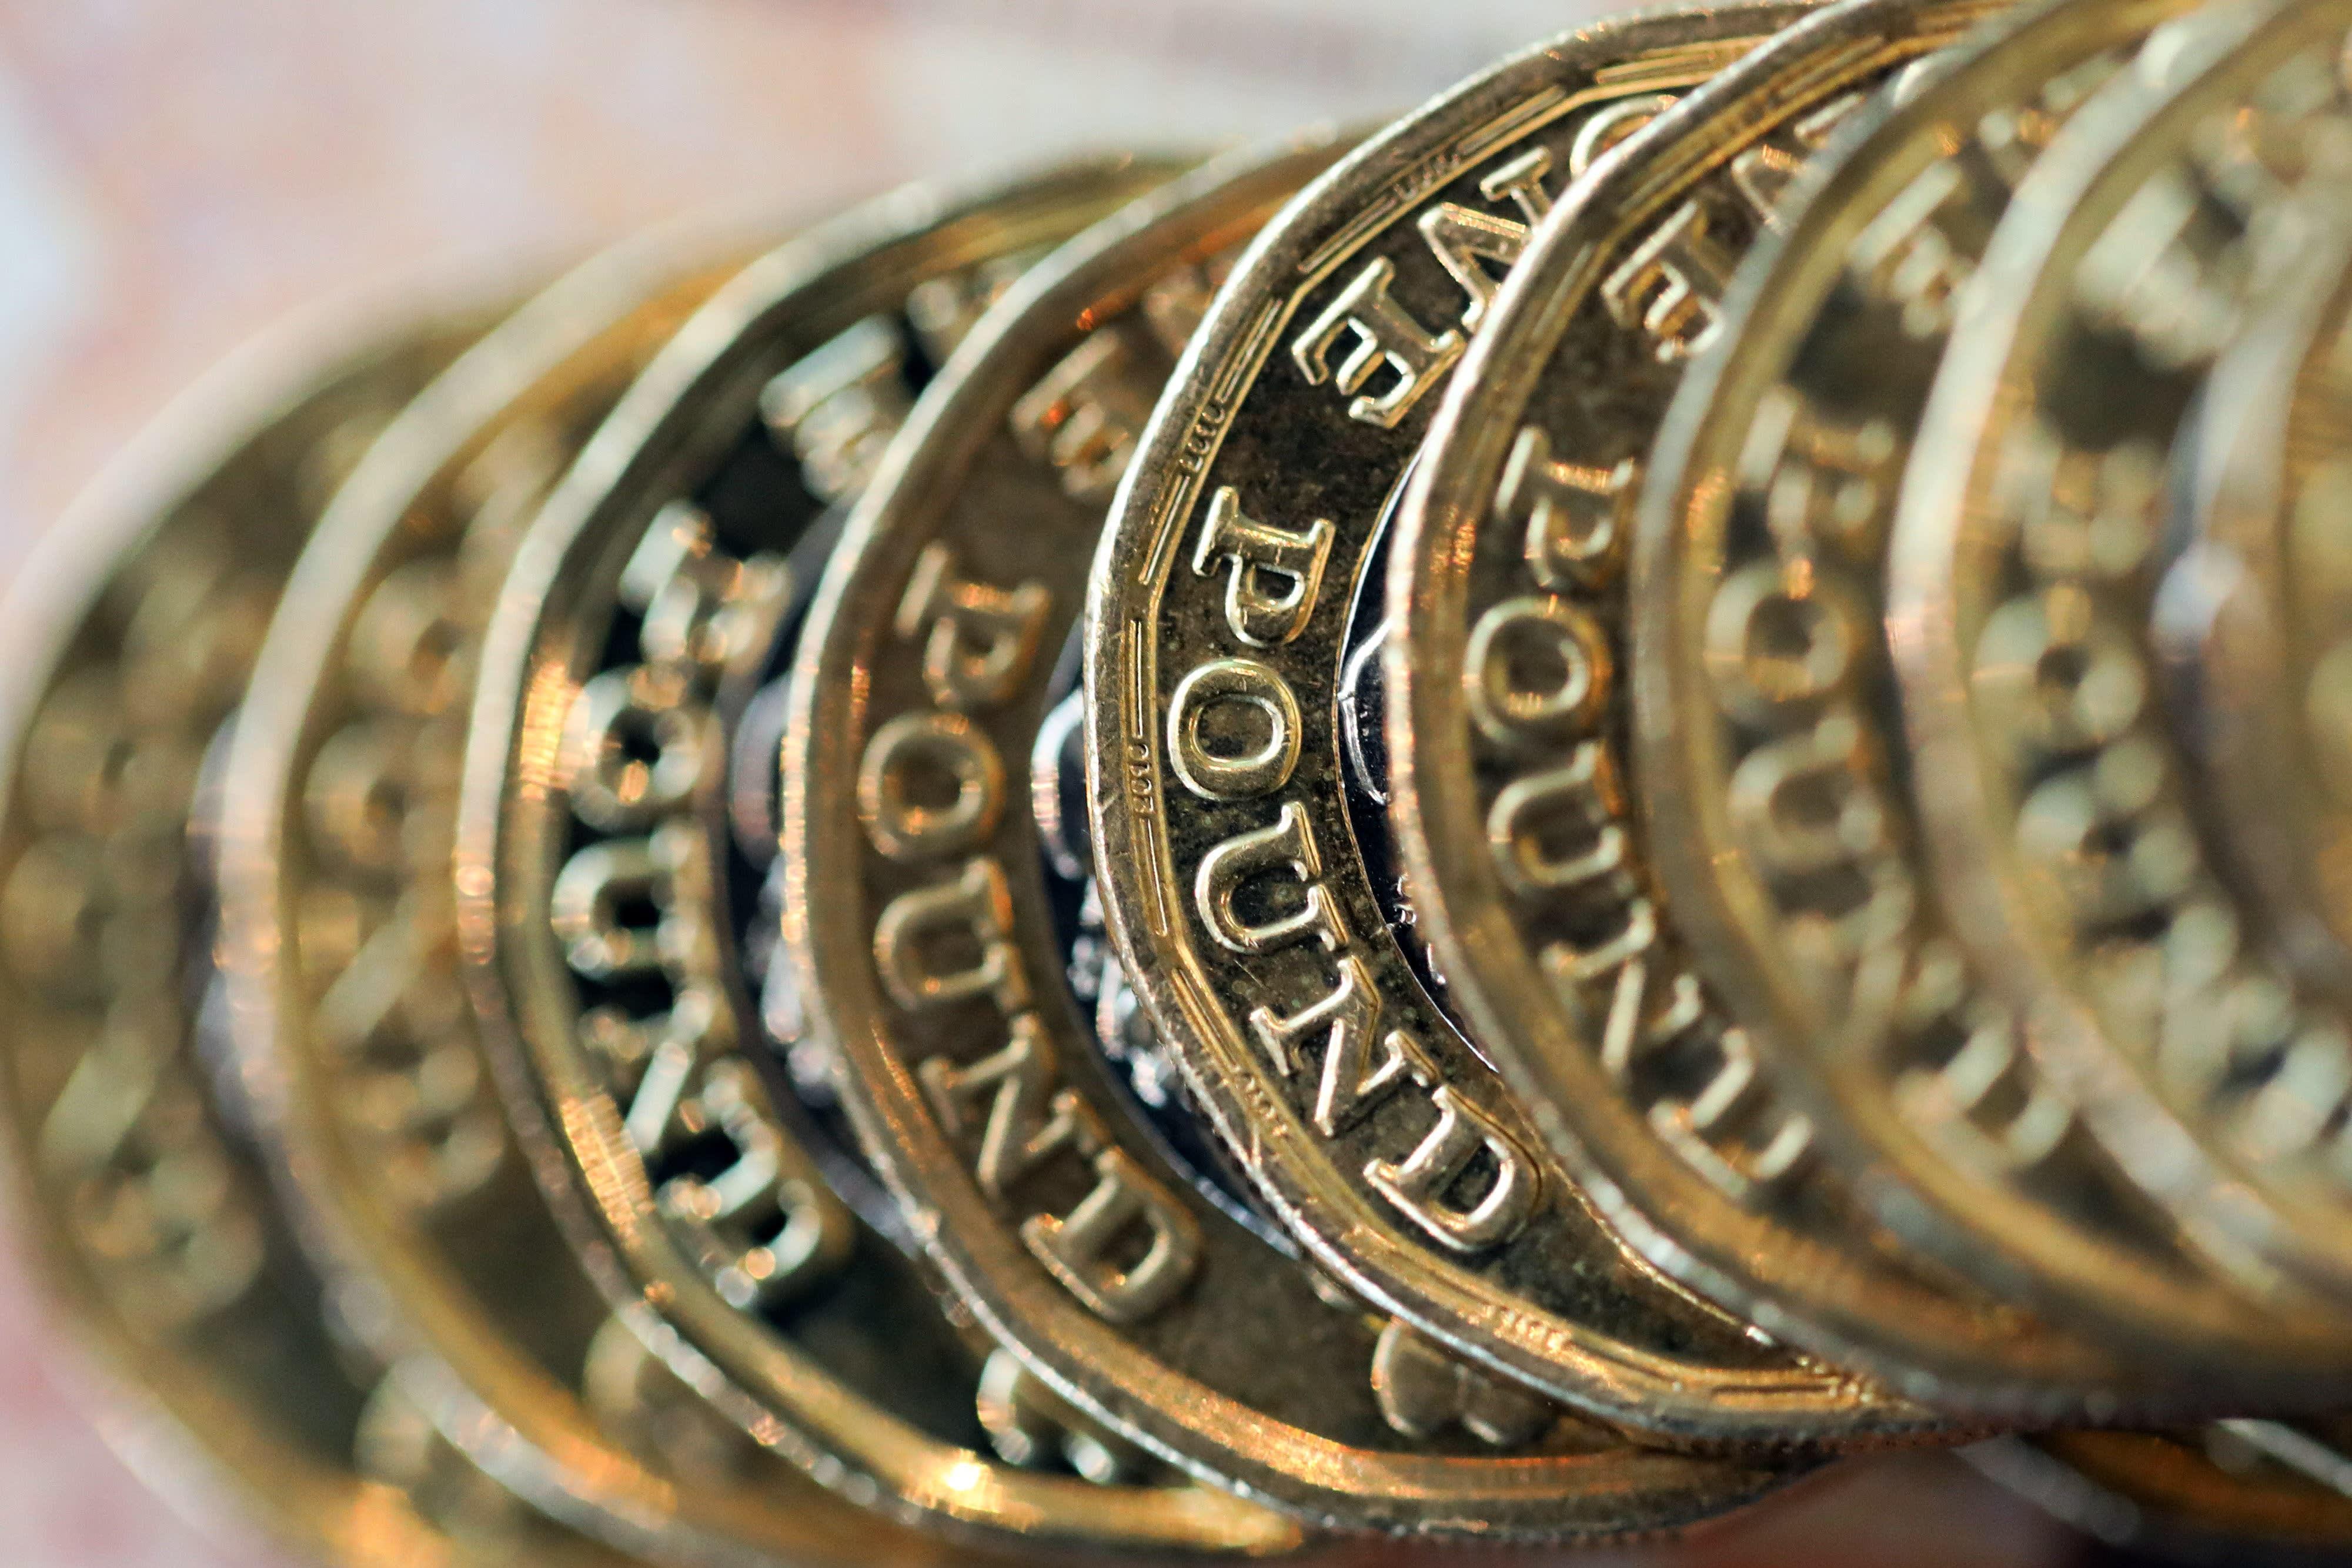 Adviser profit margins hit 8-year high